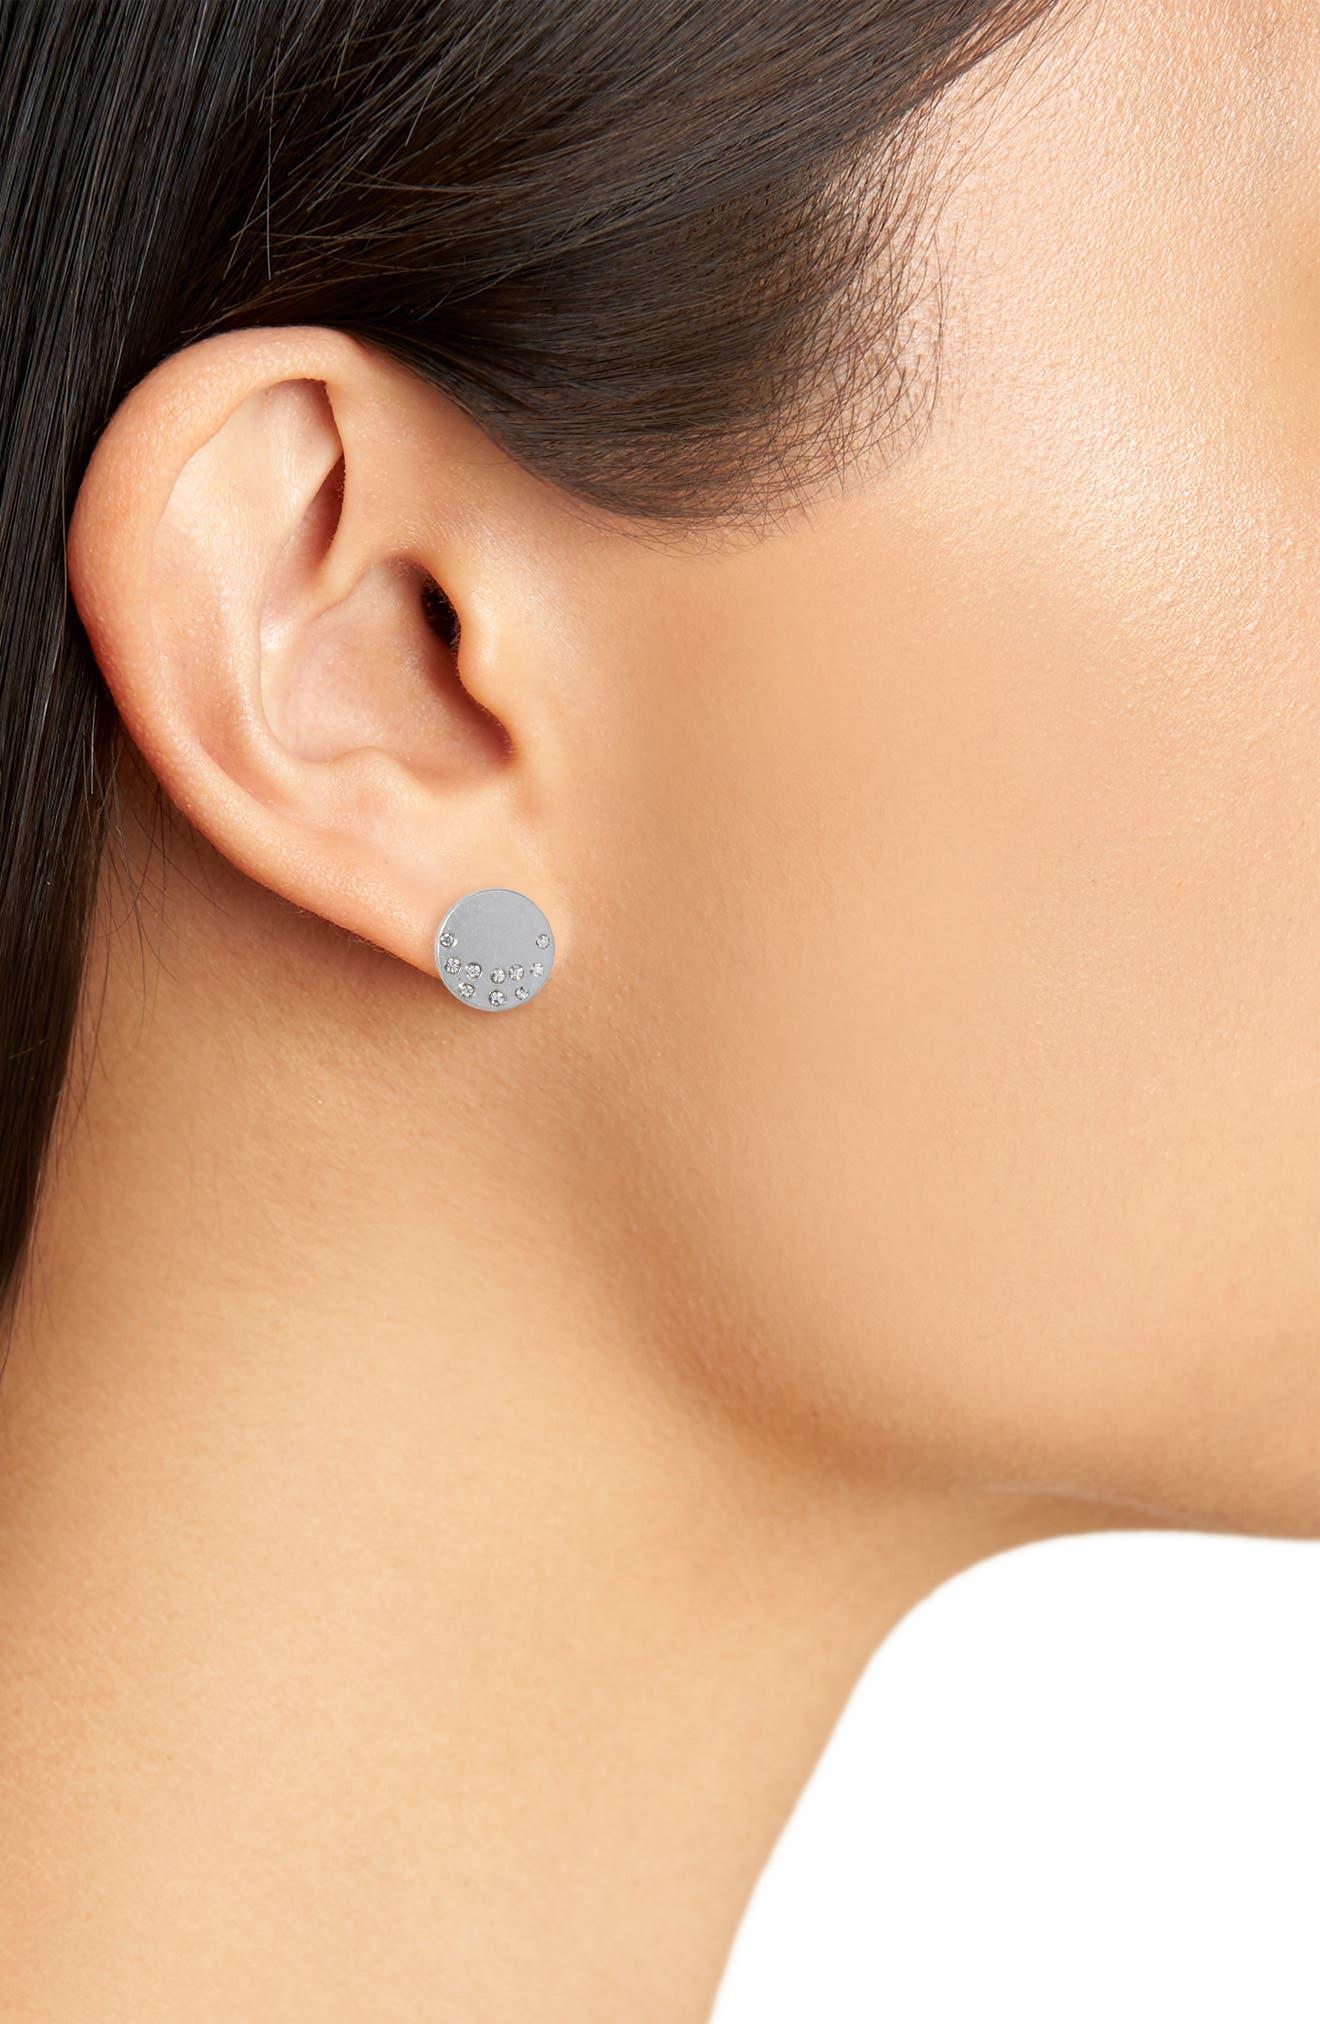 Set of 2 Stud Earrings,                             Alternate thumbnail 2, color,                             Clear- Rhodium